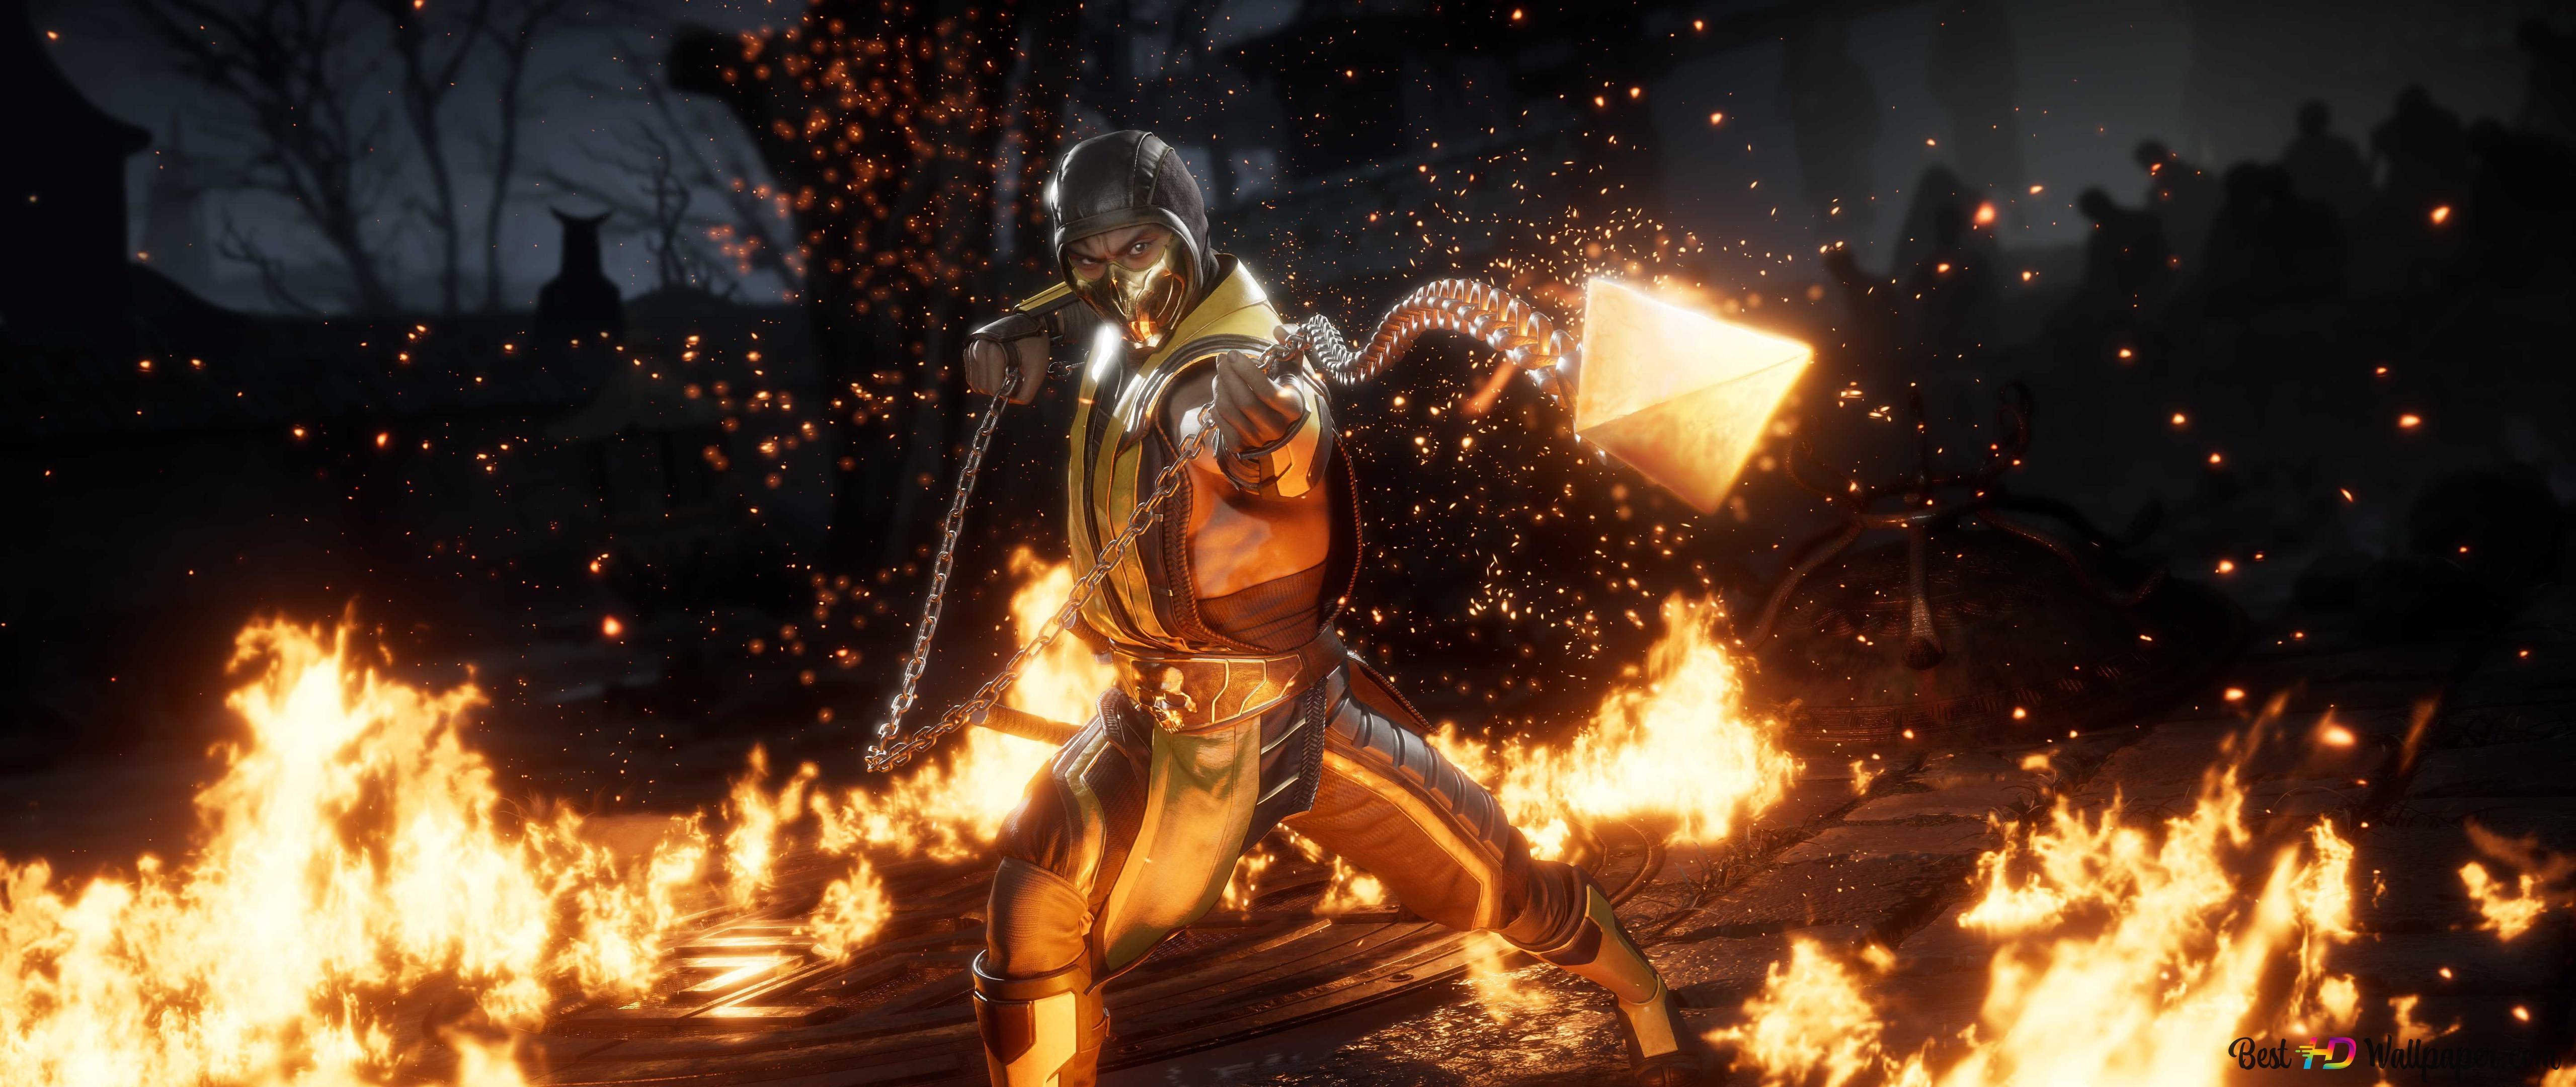 Mortal Kombat 11 2019 Scorpion Hd Wallpaper Download